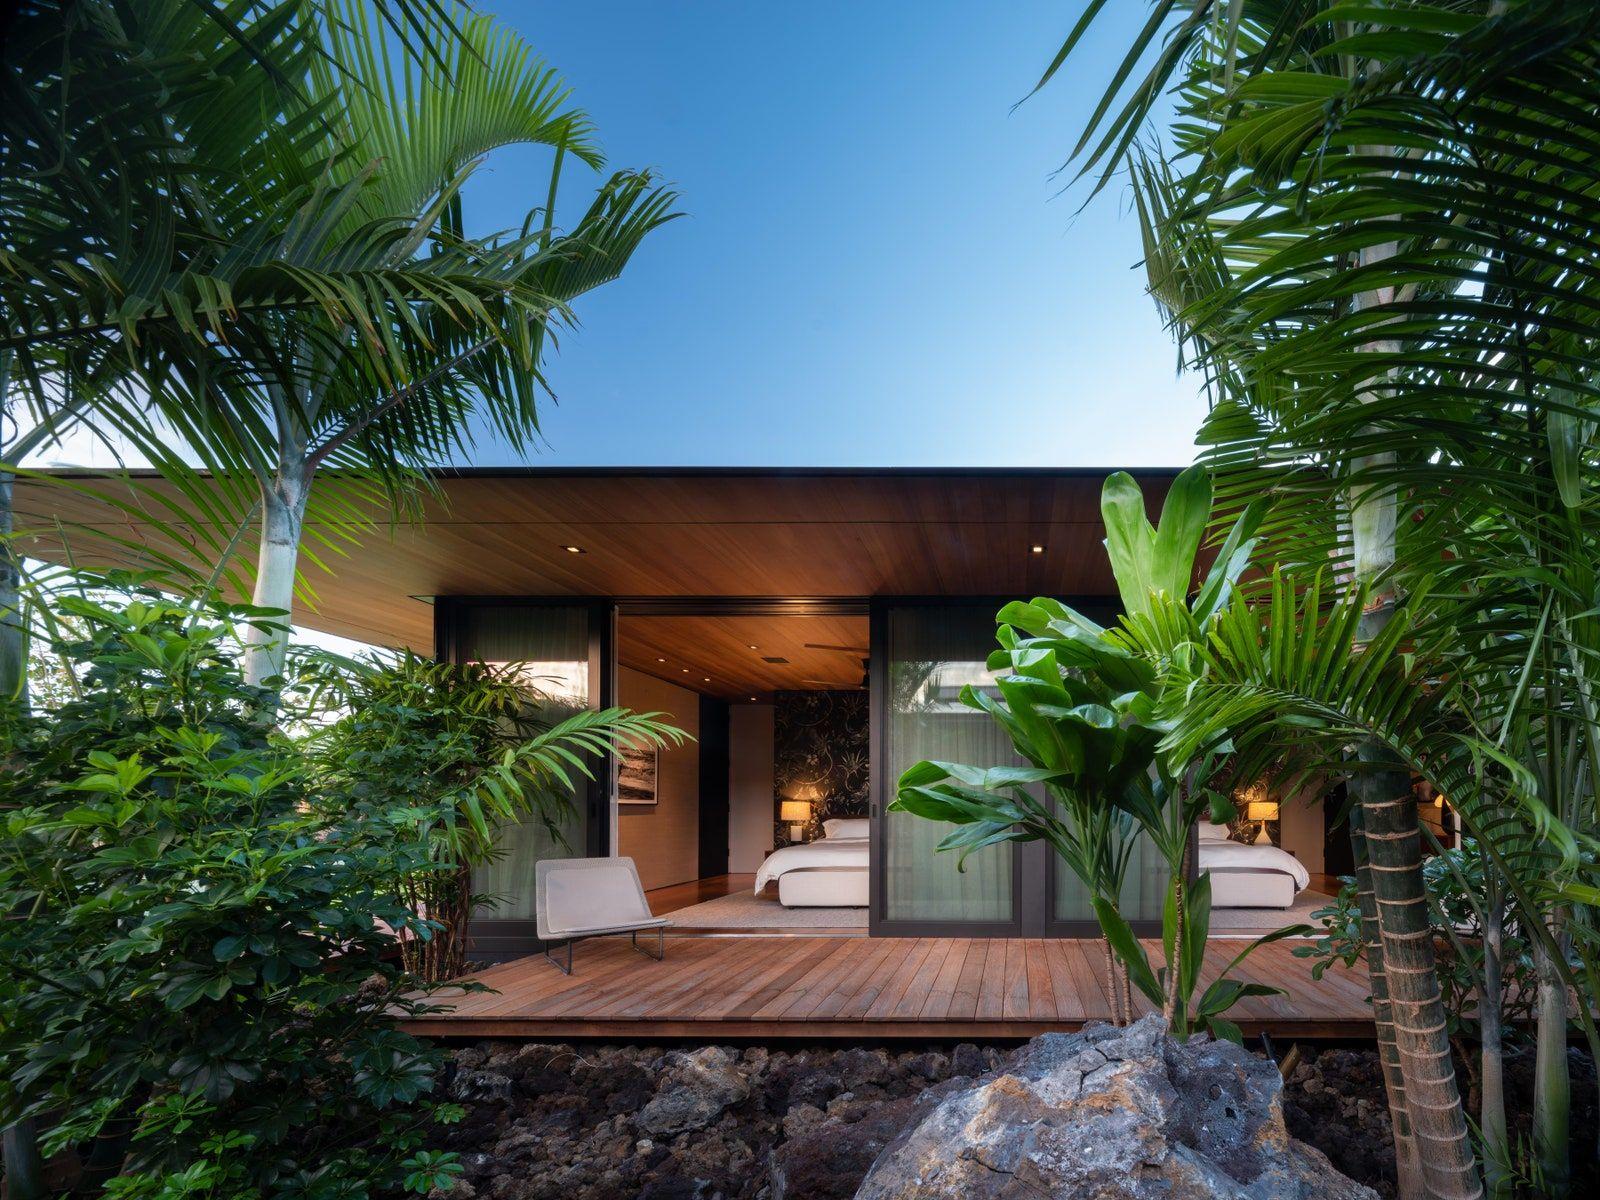 Olson Kundig S Latest Design Embraces Its Hawaiian Habitat Hawaii Homes Floating House Architecture